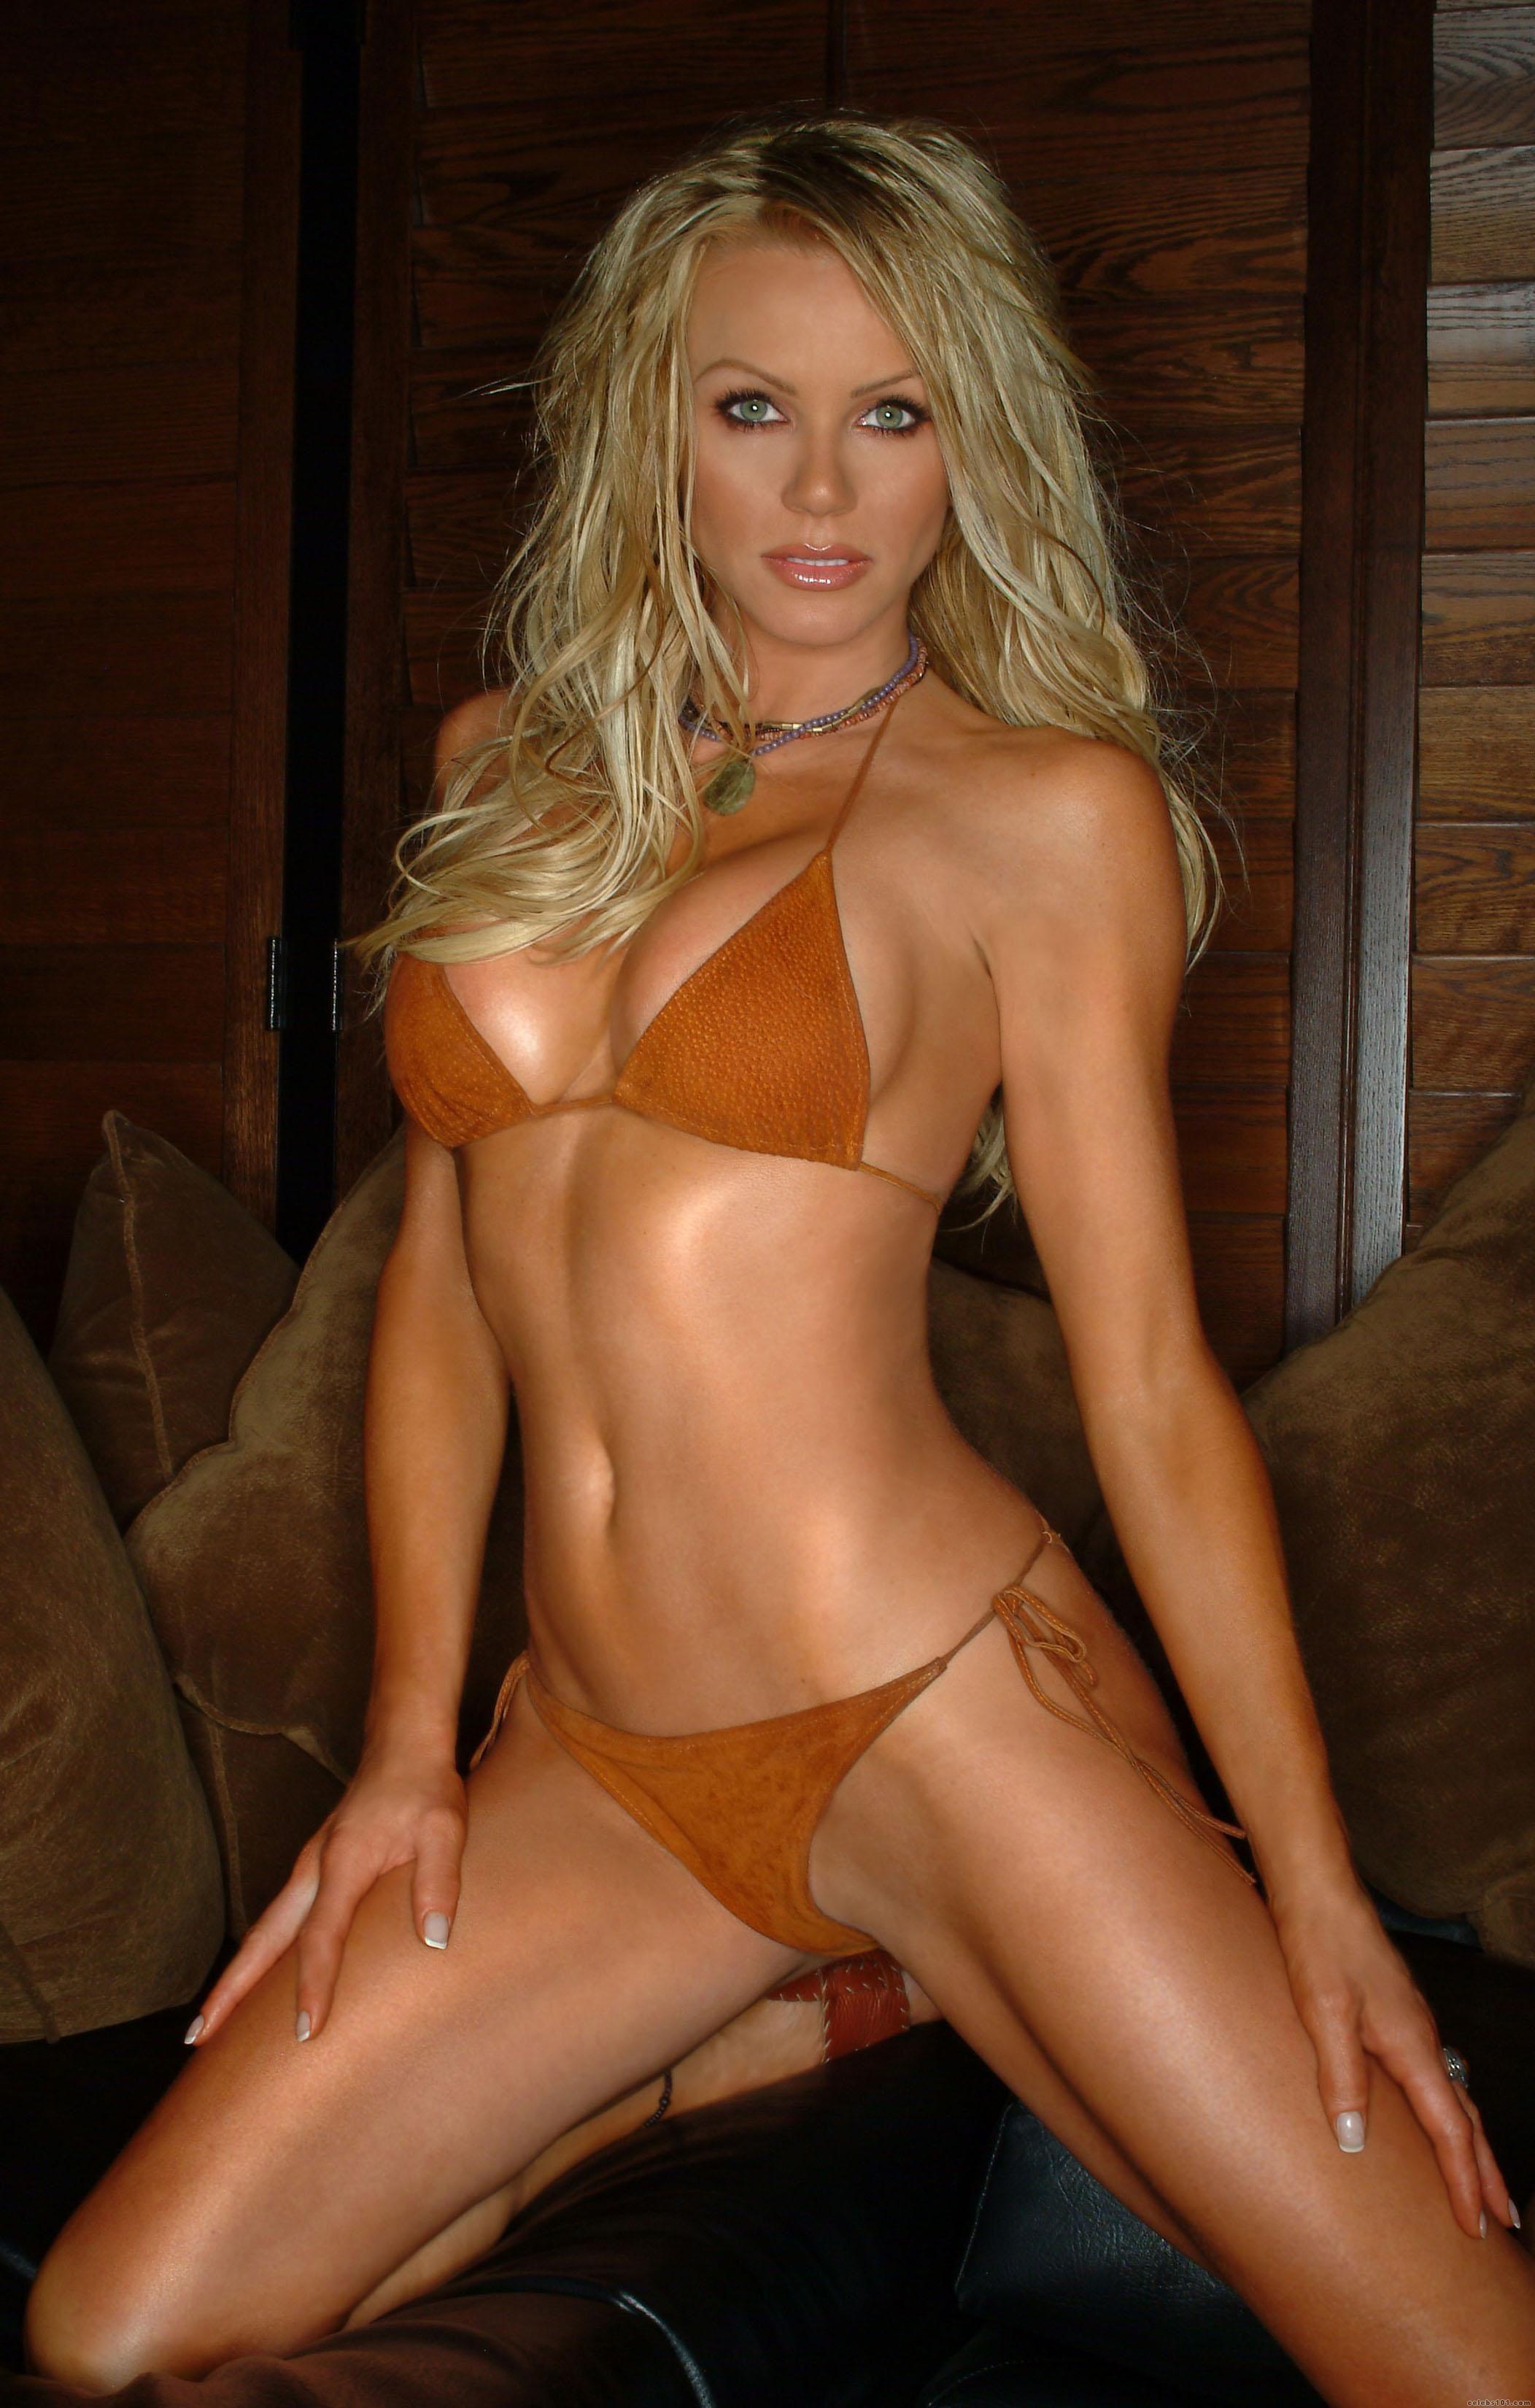 nikki ziering nice hot women bikinis. Black Bedroom Furniture Sets. Home Design Ideas